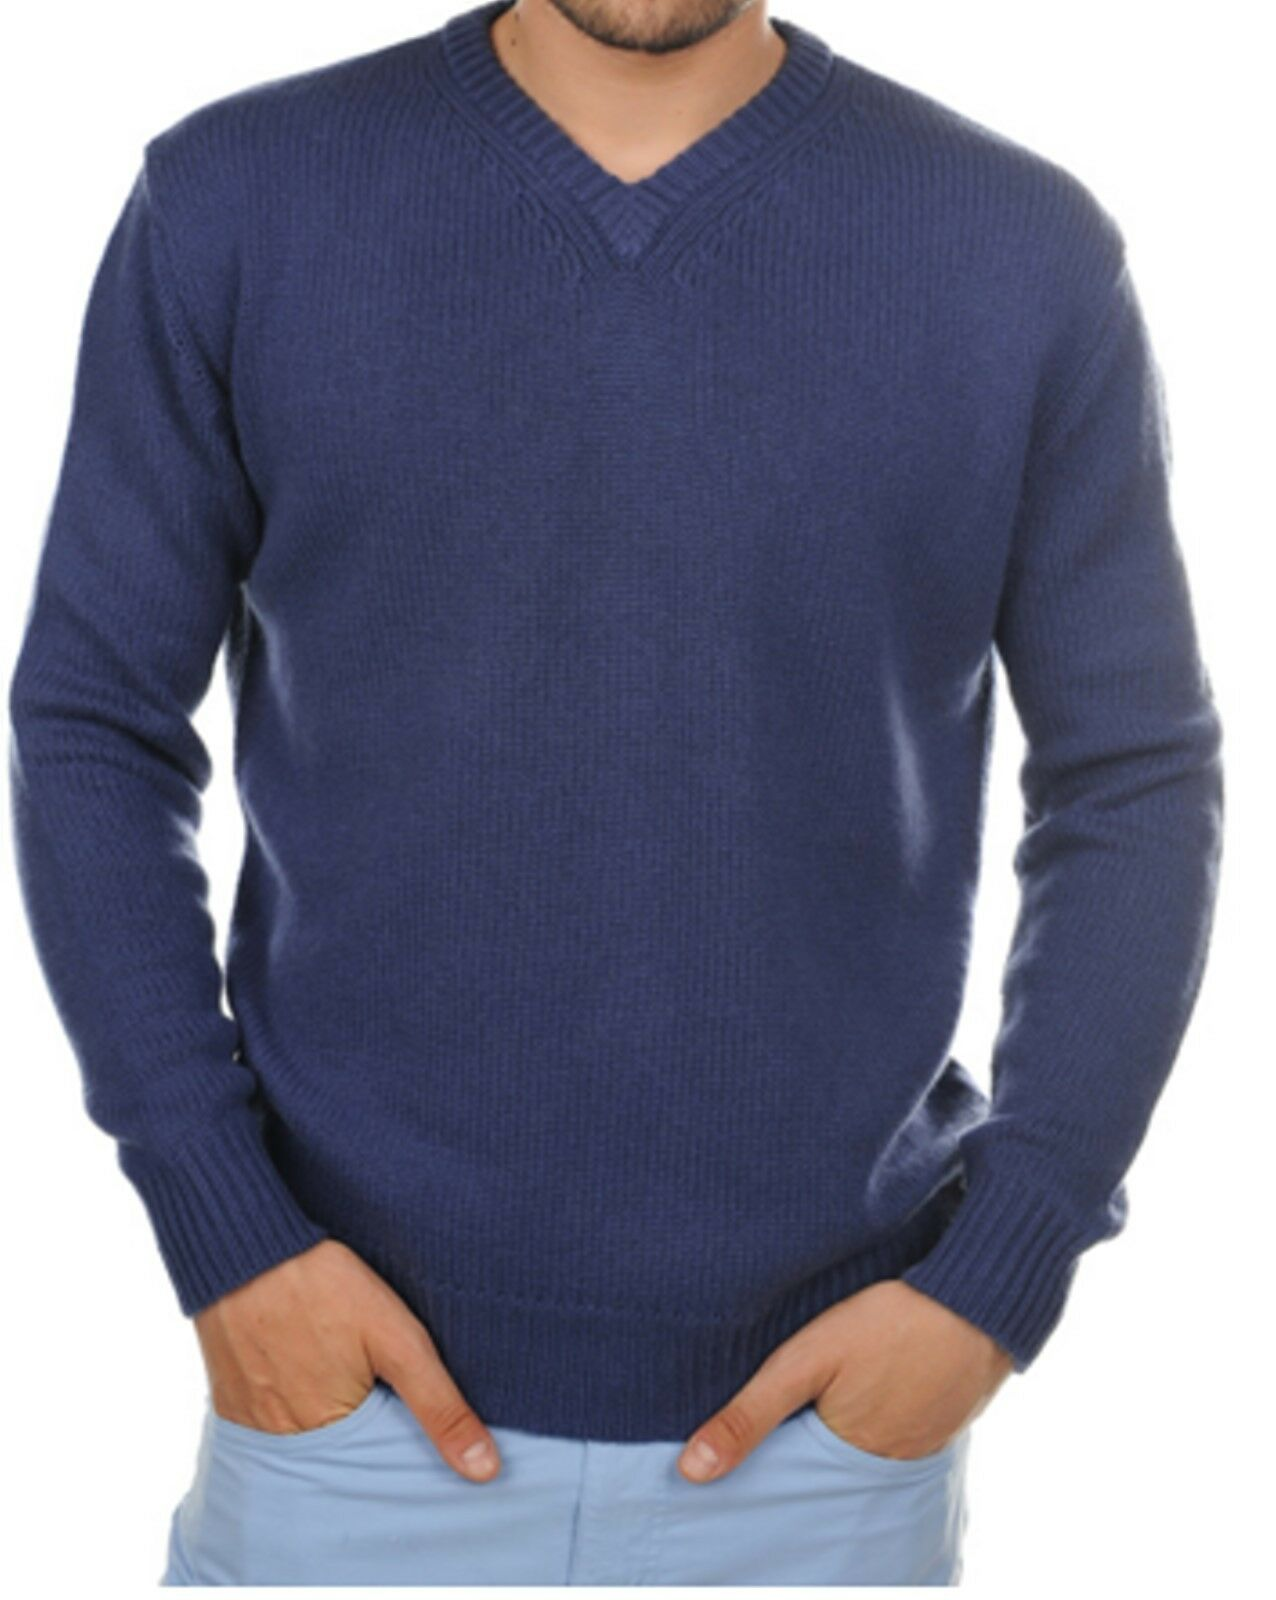 Balldiri 100% Cashmere Herren Pullover V-Ausschnitt 8-fädig kobaltblau L